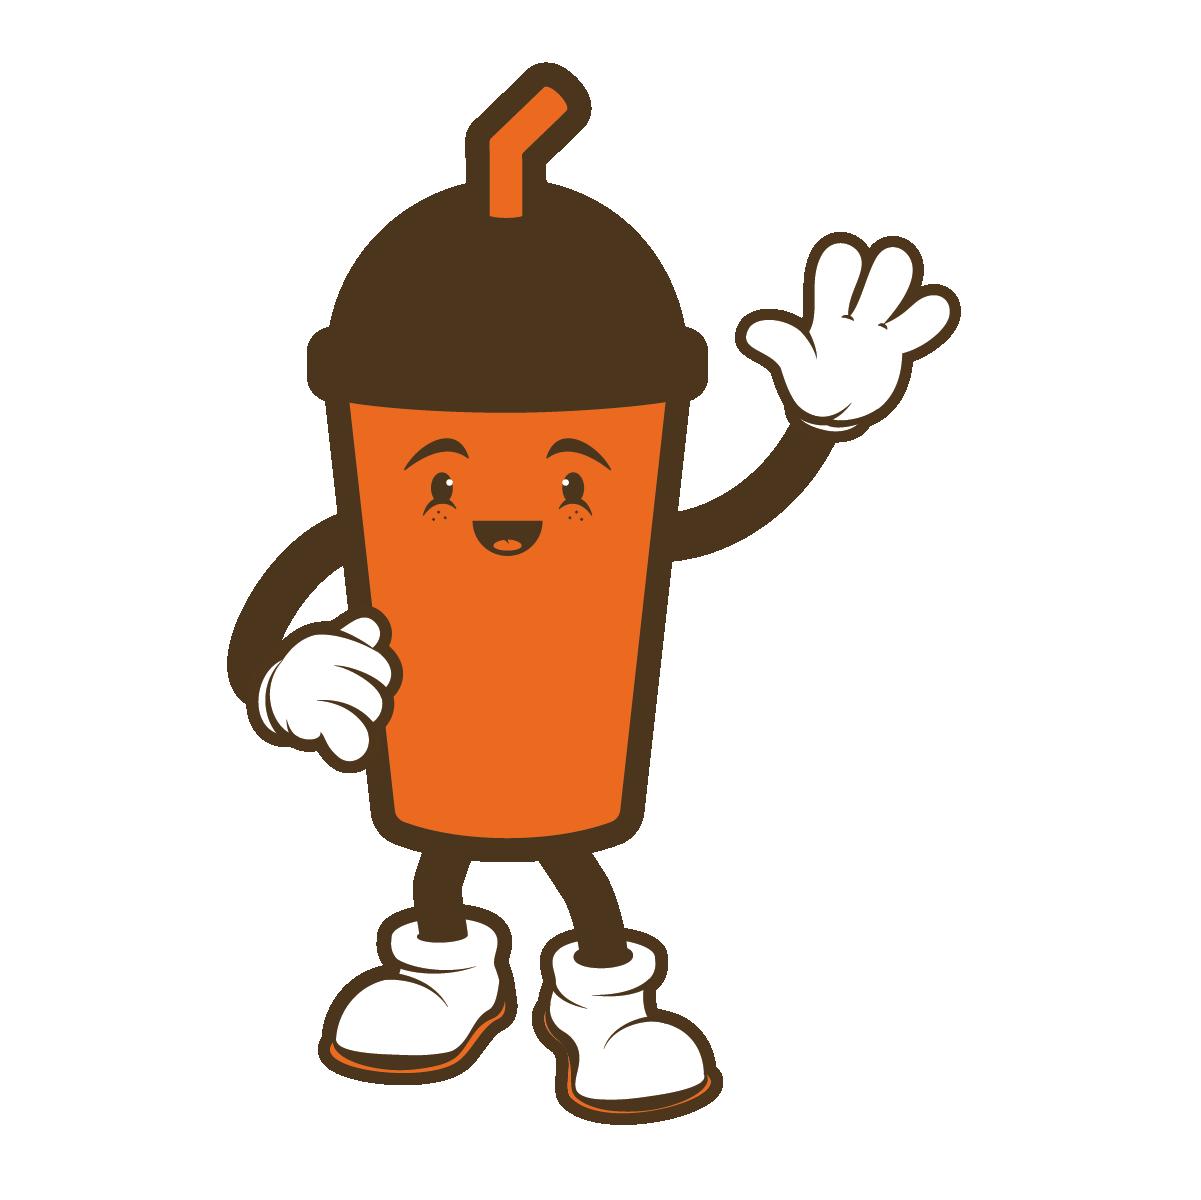 Square Burger Shake Mascot